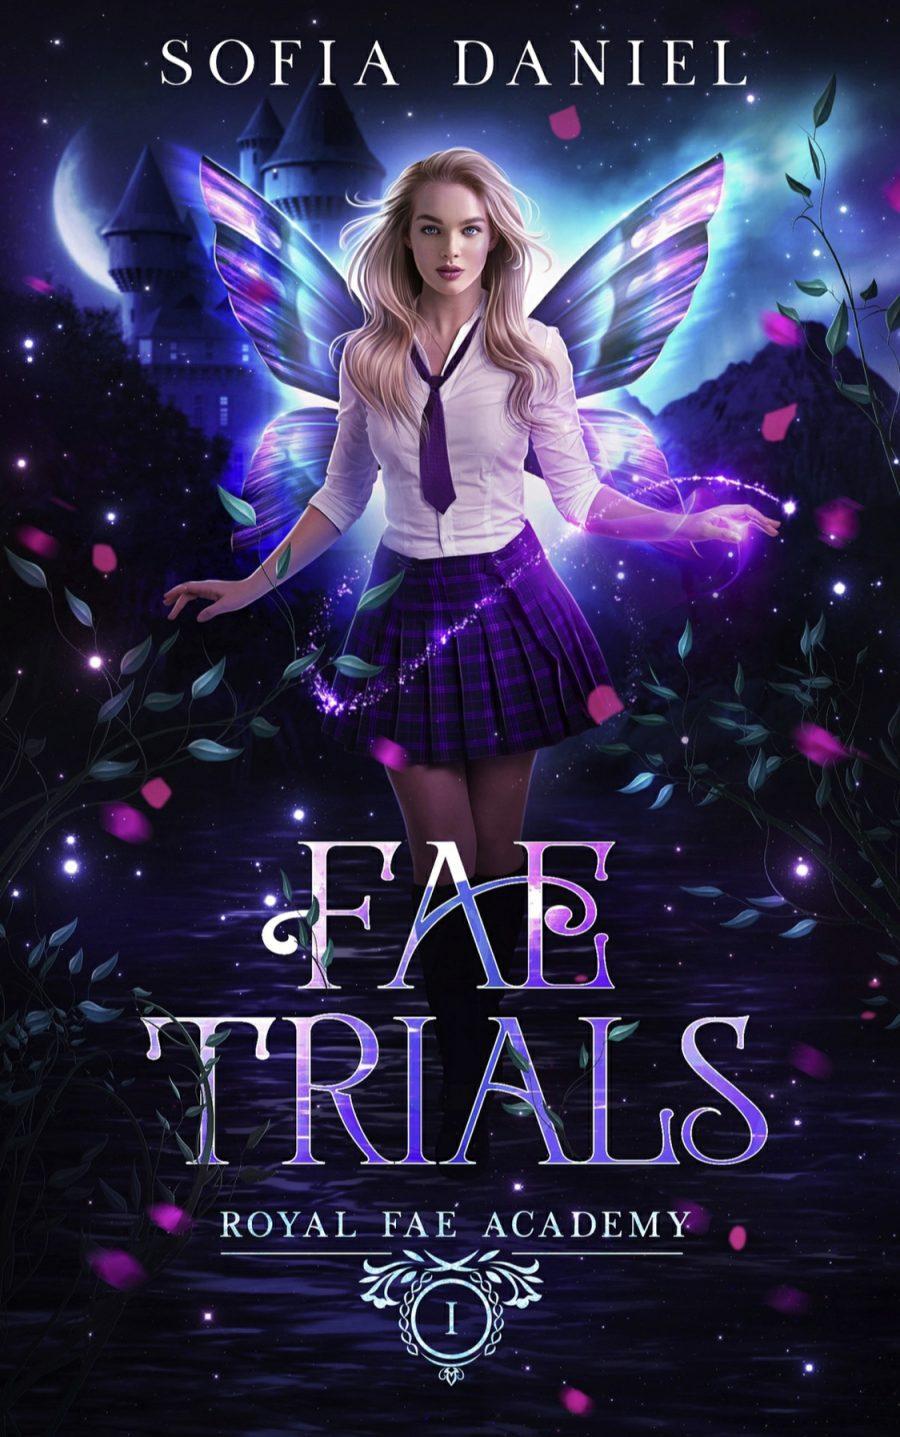 Fae Trials (Royal Fae Academy - Book 1) by Sofia Daniels - A Book Review #BookReview #Academy #PNR #SlowBurn #RH #Bully #ReverseHarem #WhyChoose #KindleUnlimited #KU